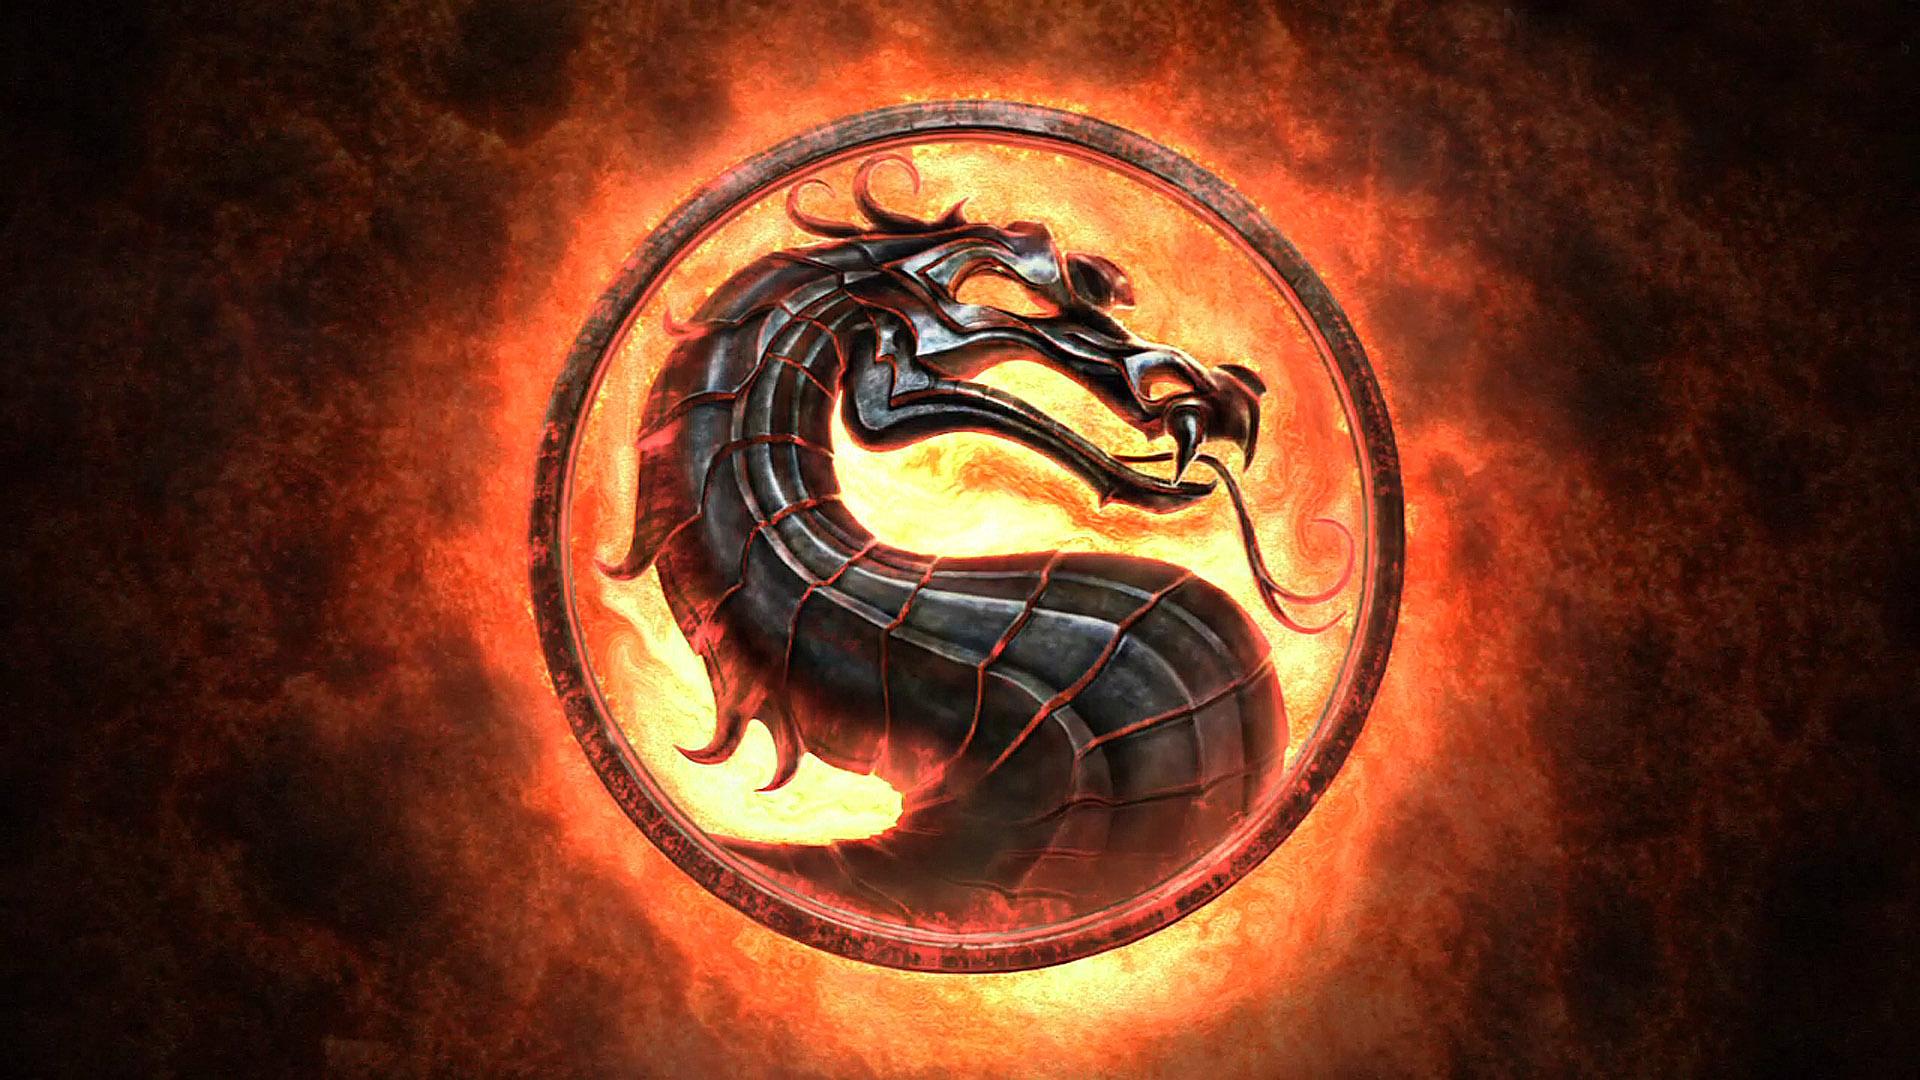 Ed Boon brinca sobre possível novo Mortal Kombat no Twitter